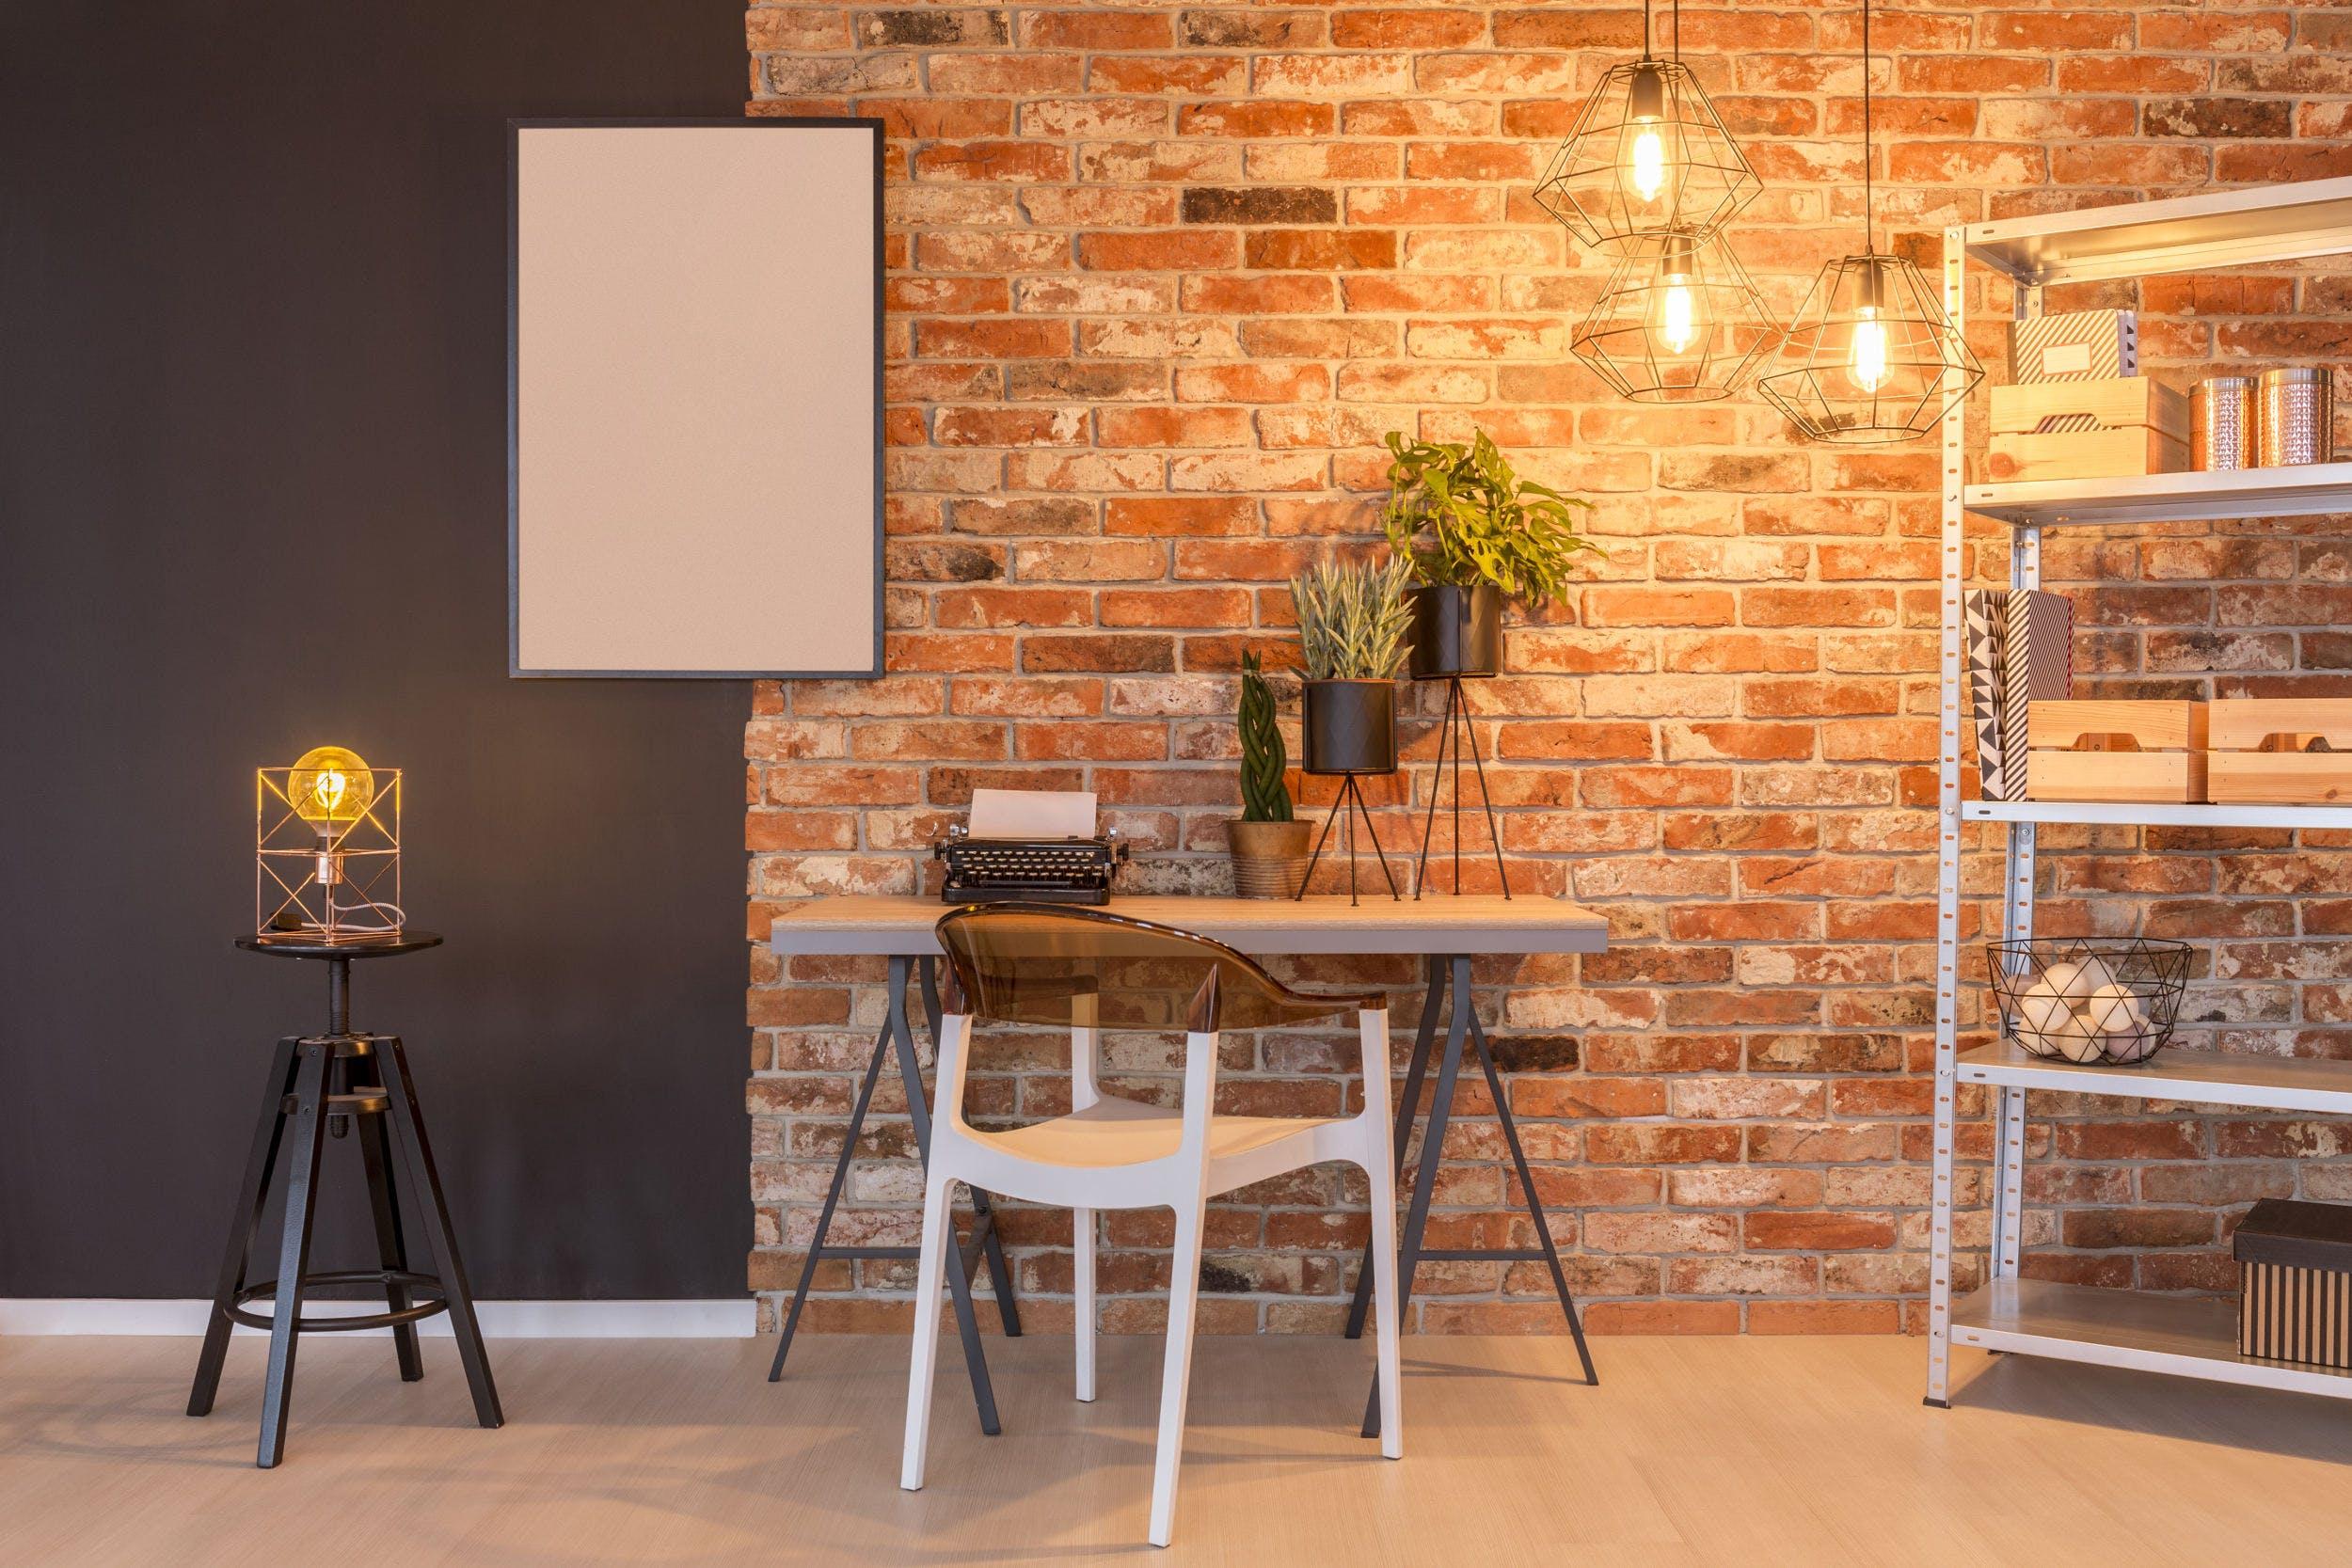 Image of shutterstock 6385822118 1 in Industrial style in interior design - Cosentino